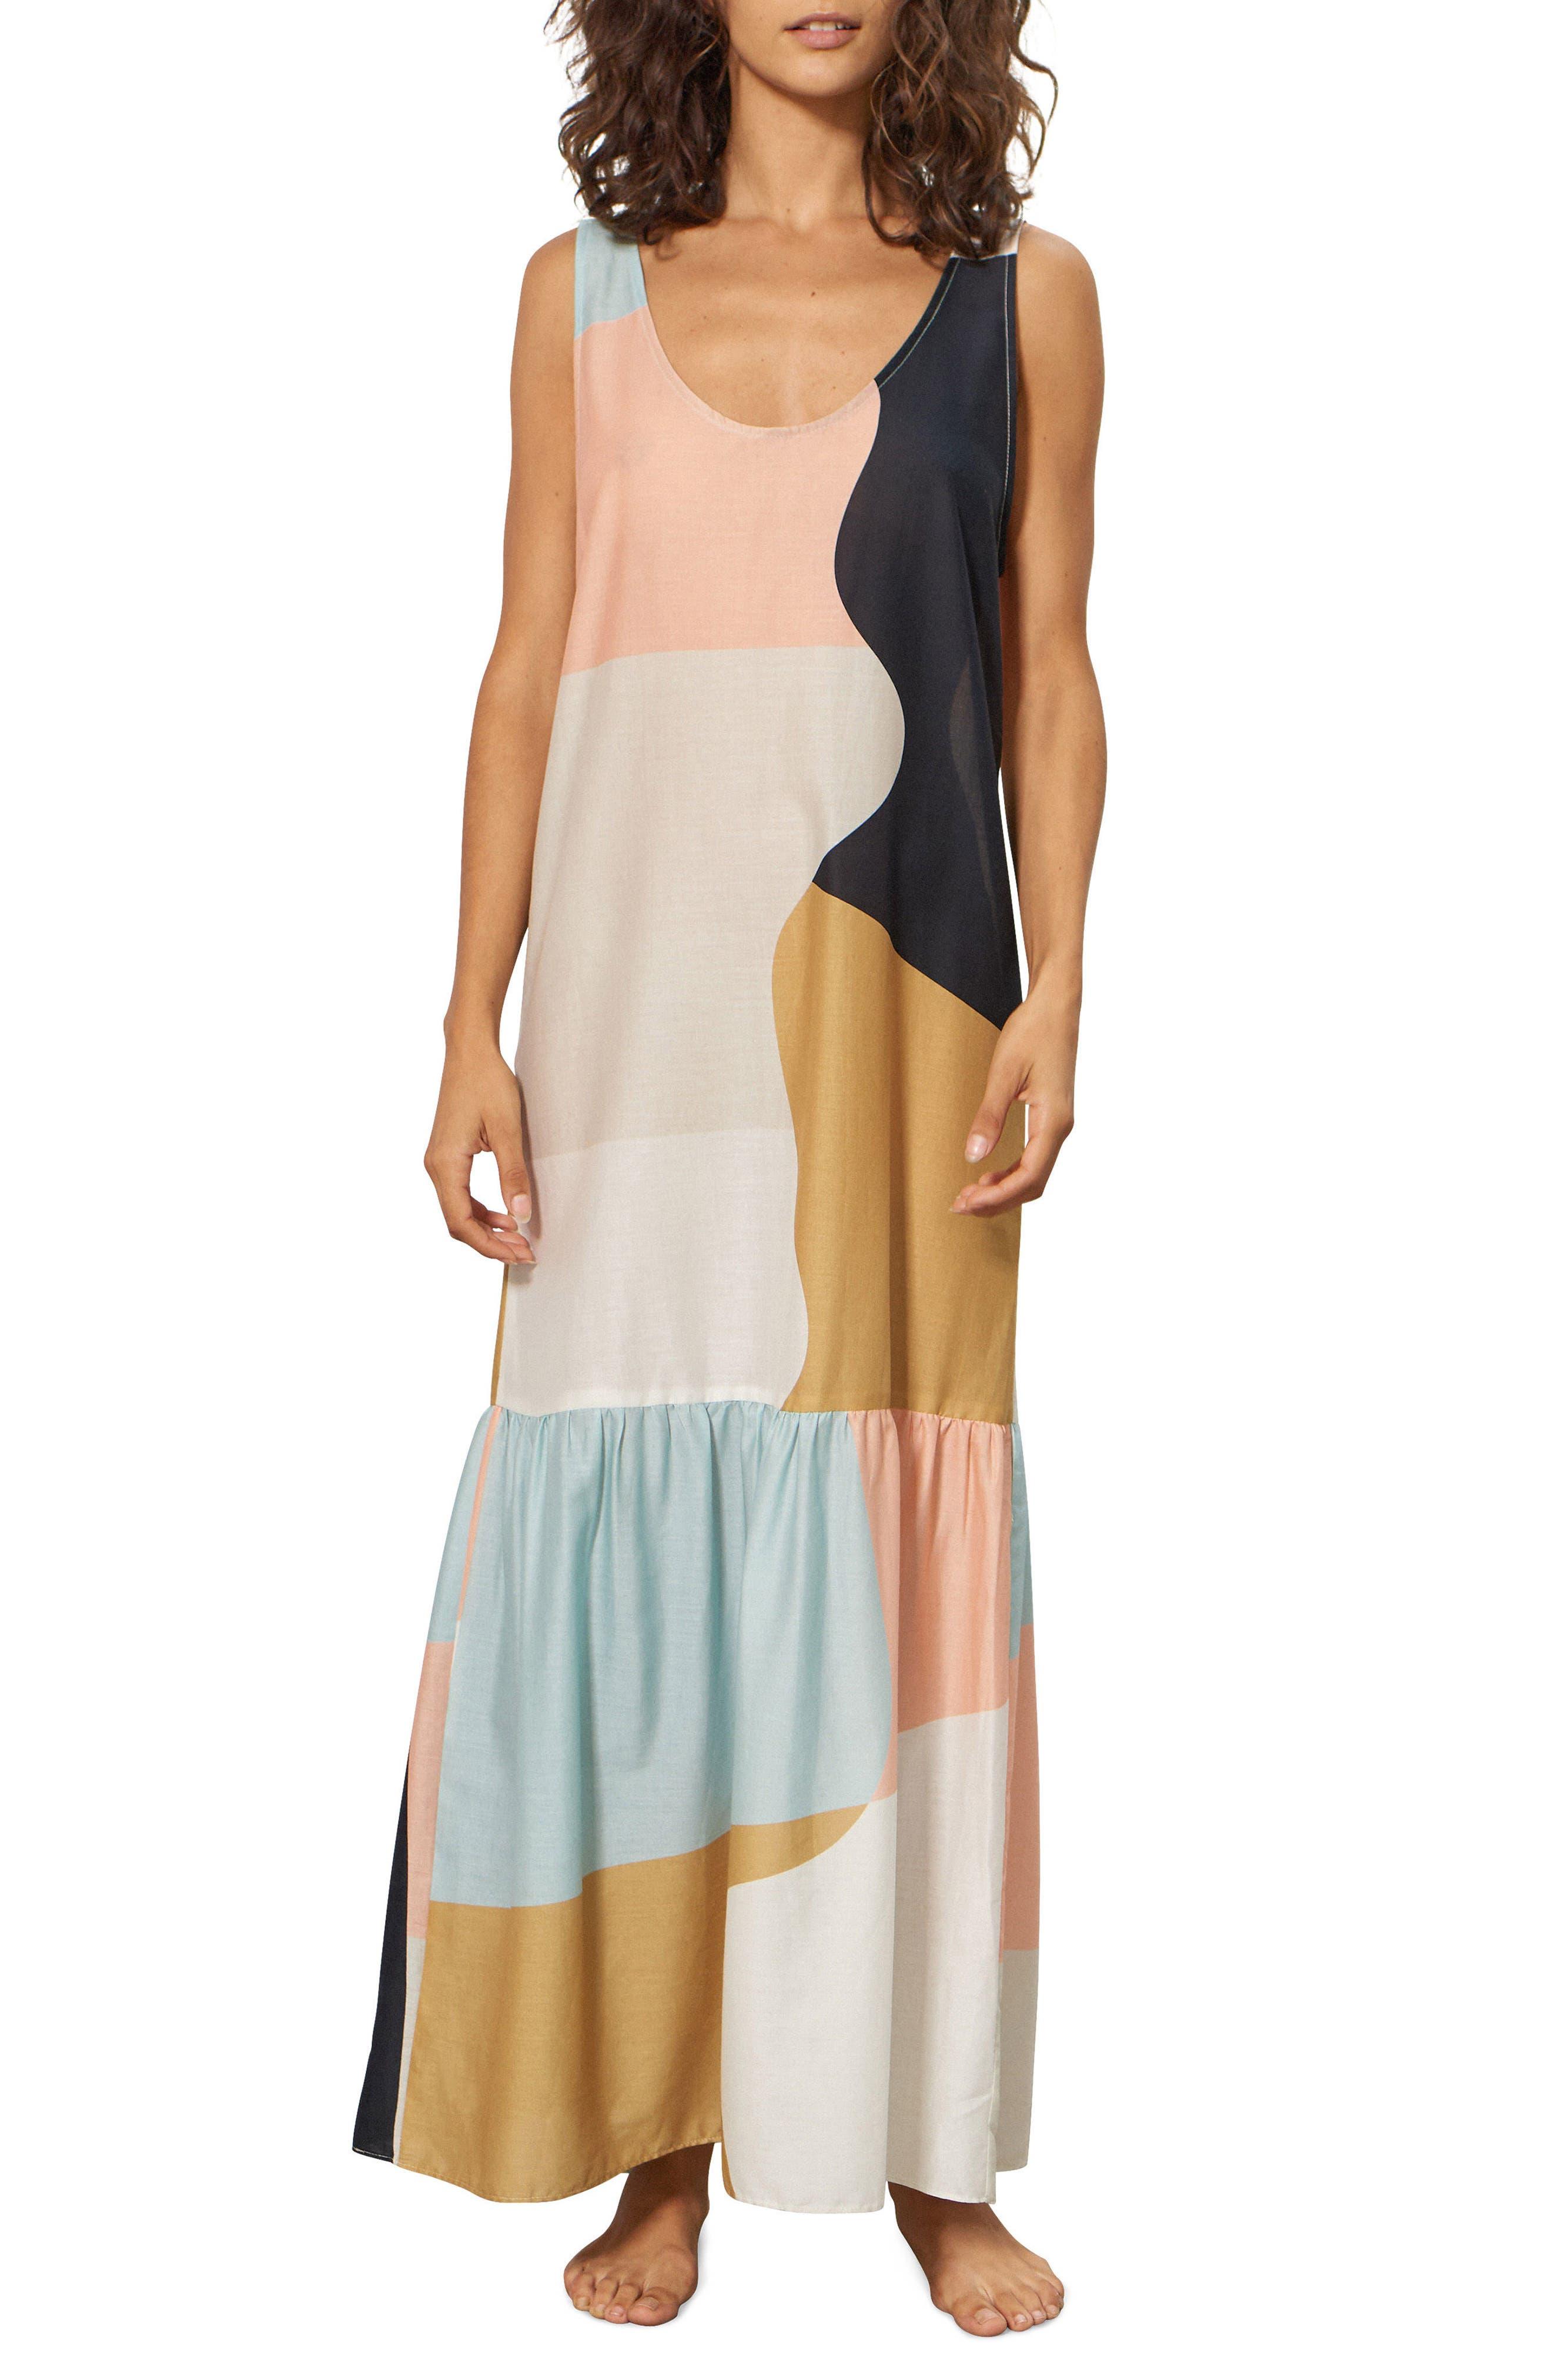 Valentina Cover-Up Dress,                             Main thumbnail 1, color,                             Peach Multi